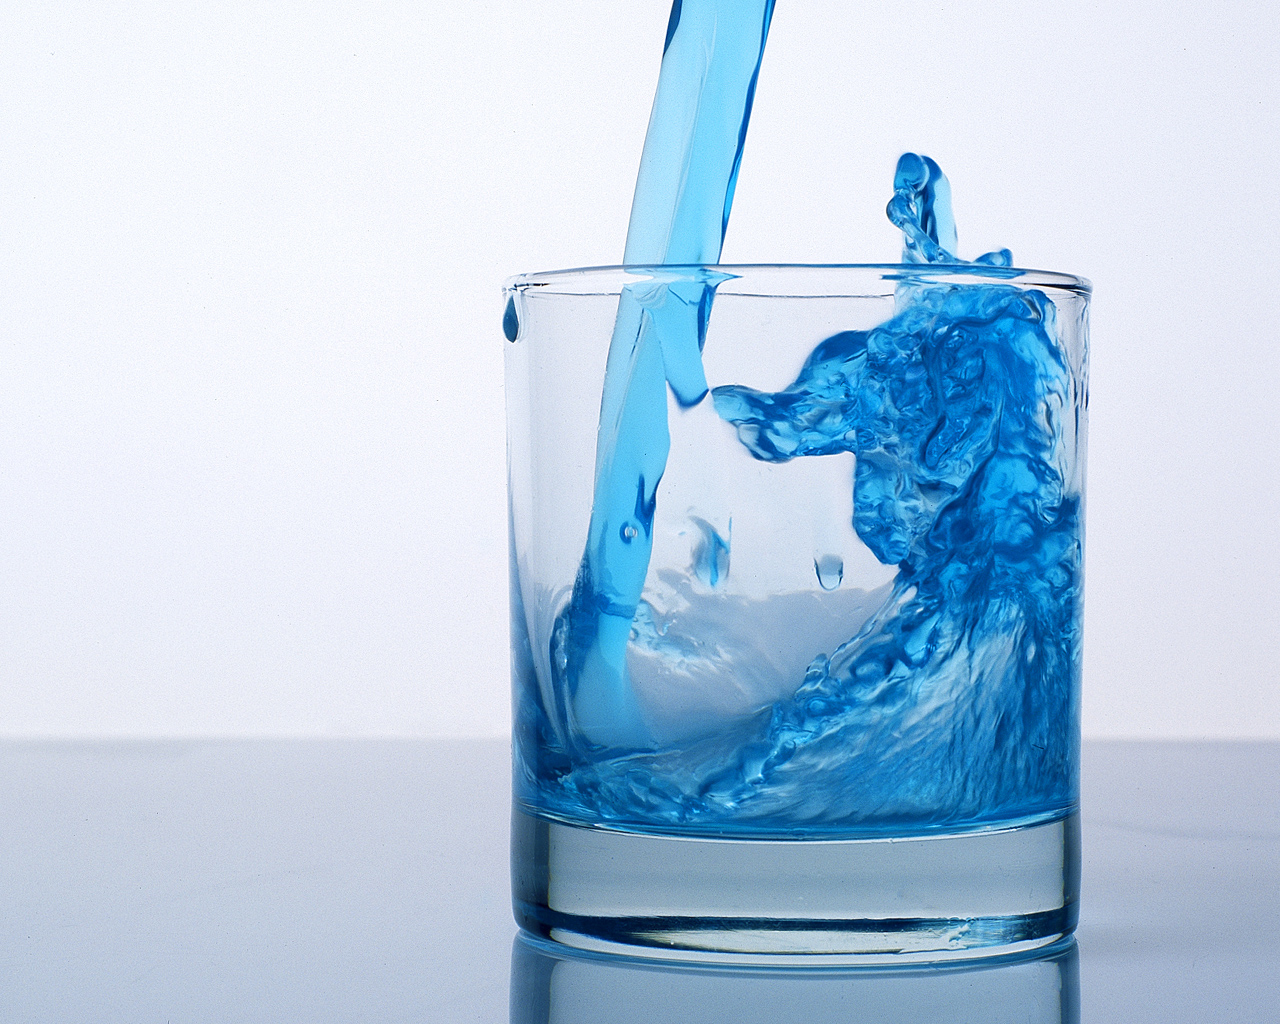 Glass Liquid 1280x1024